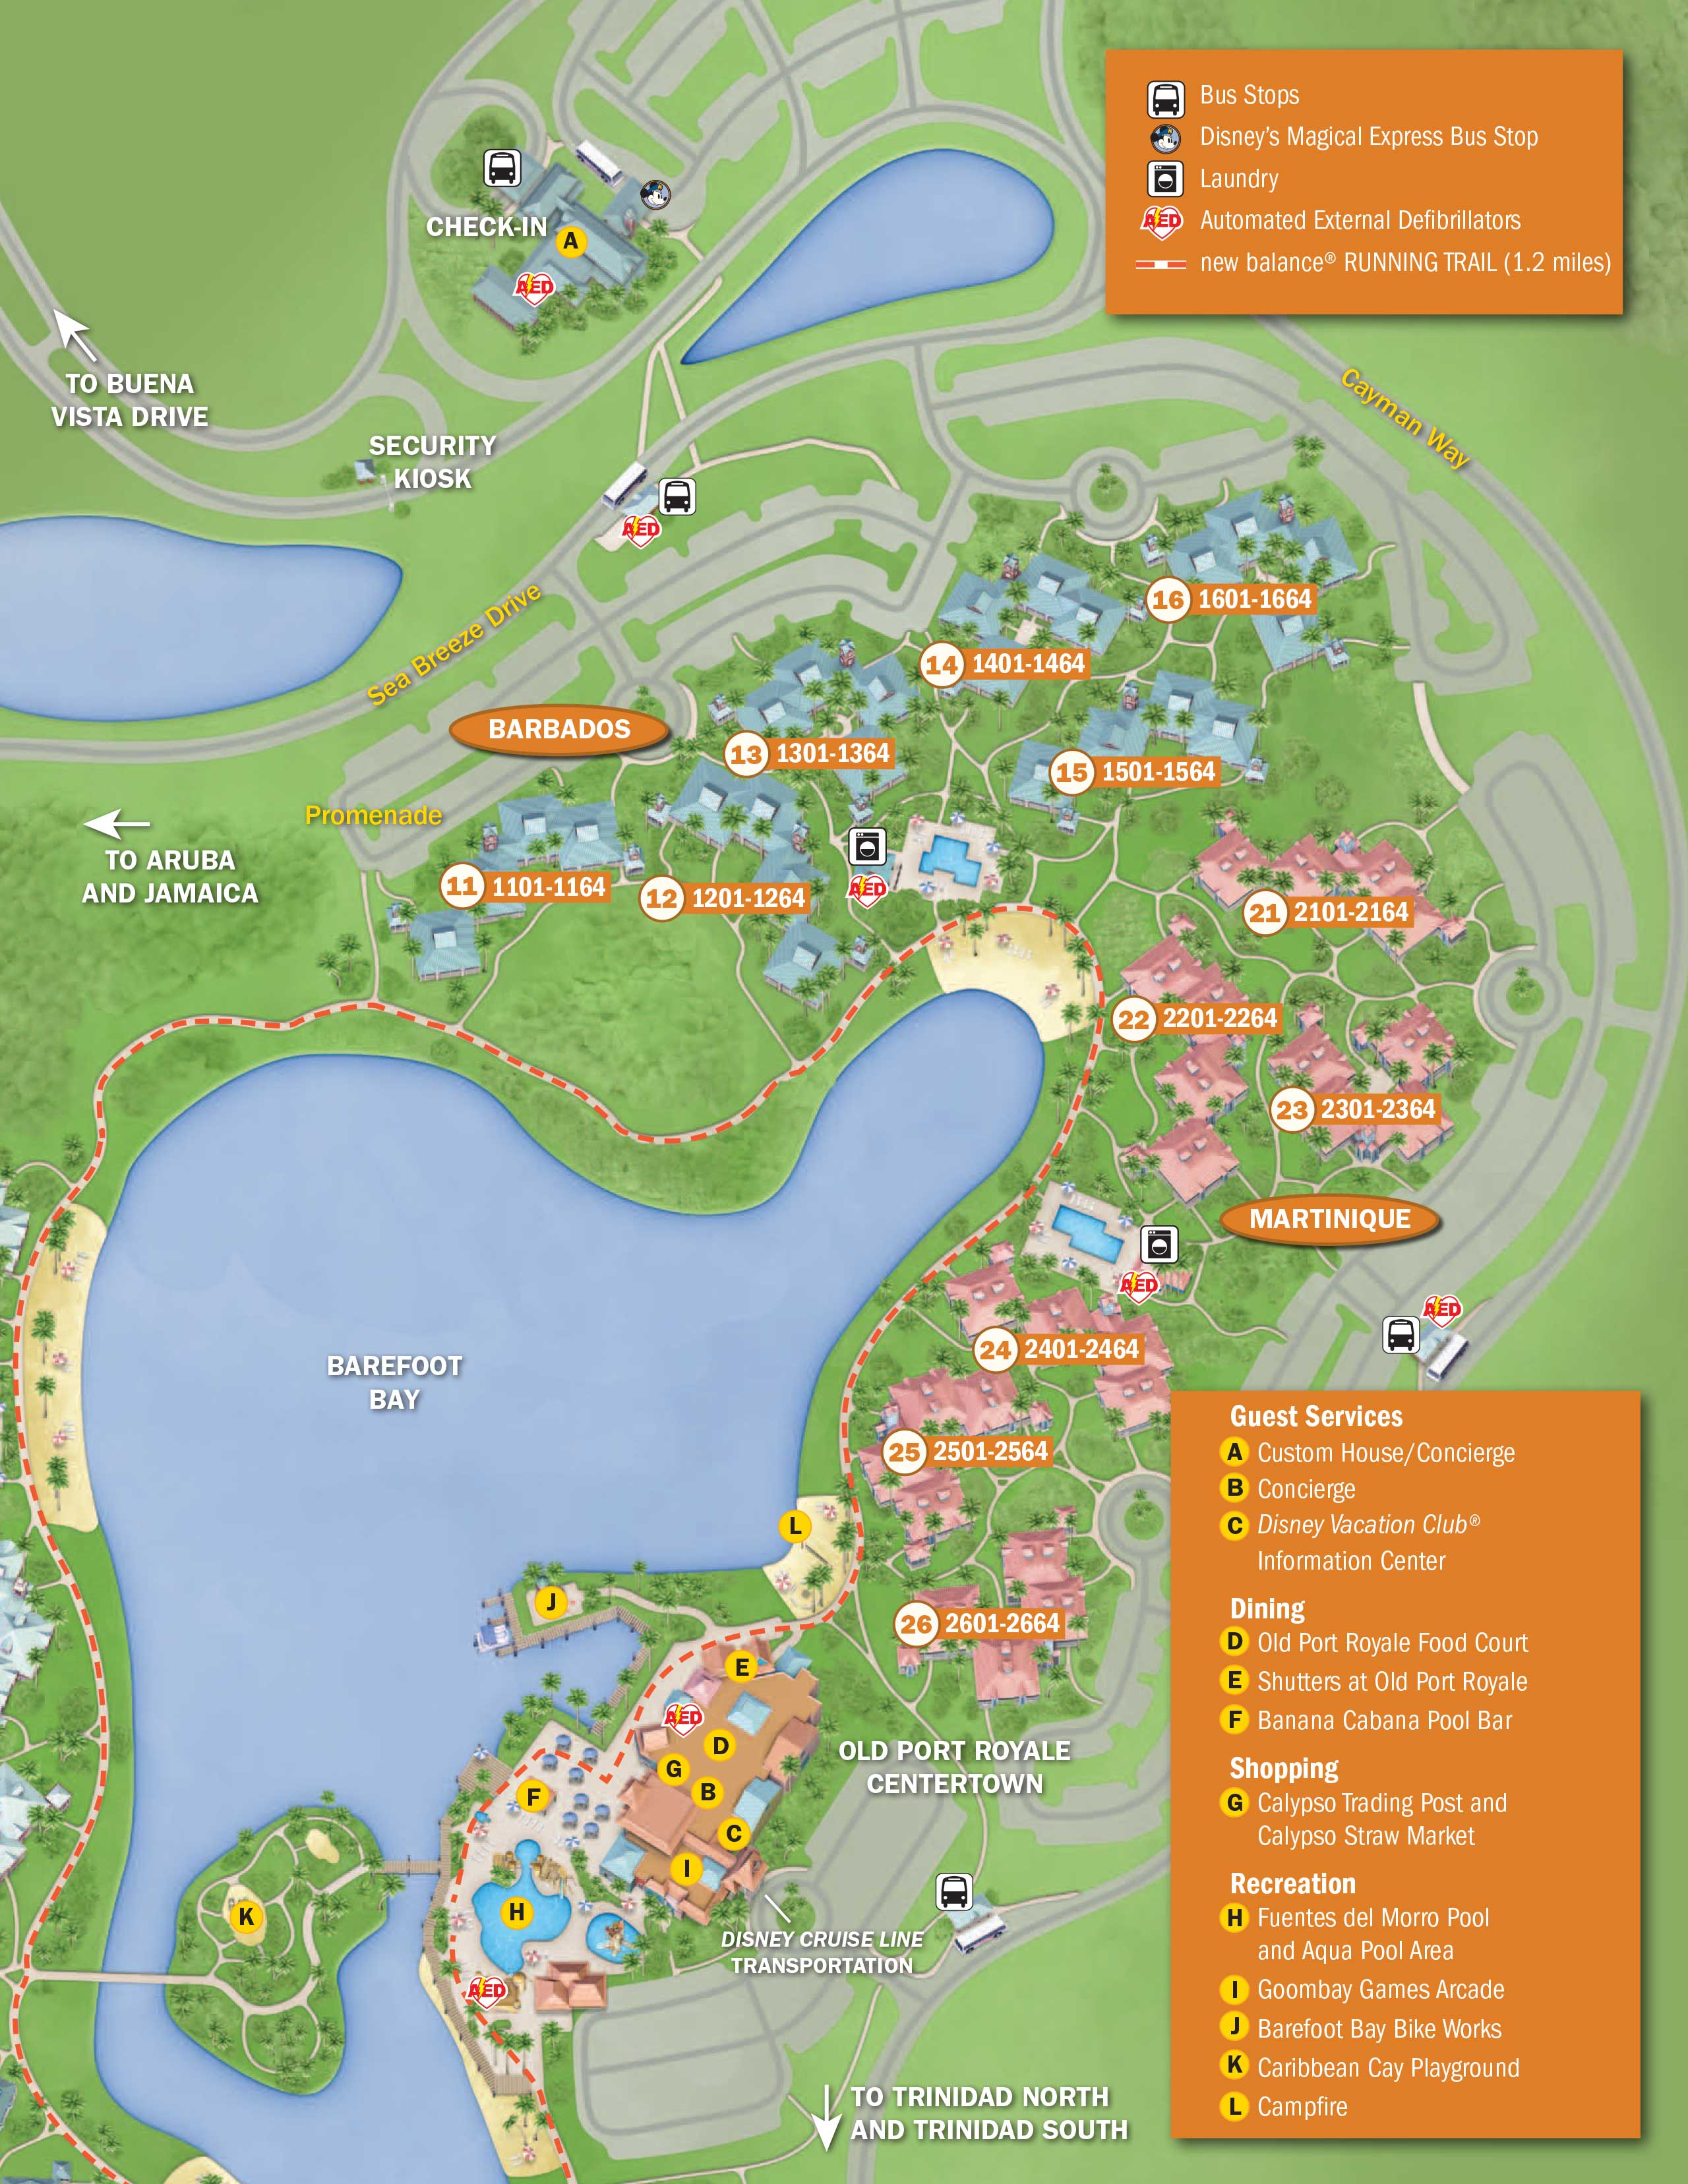 April 2017 Walt Disney World Resort Hotel Maps - Photo 16 of 33